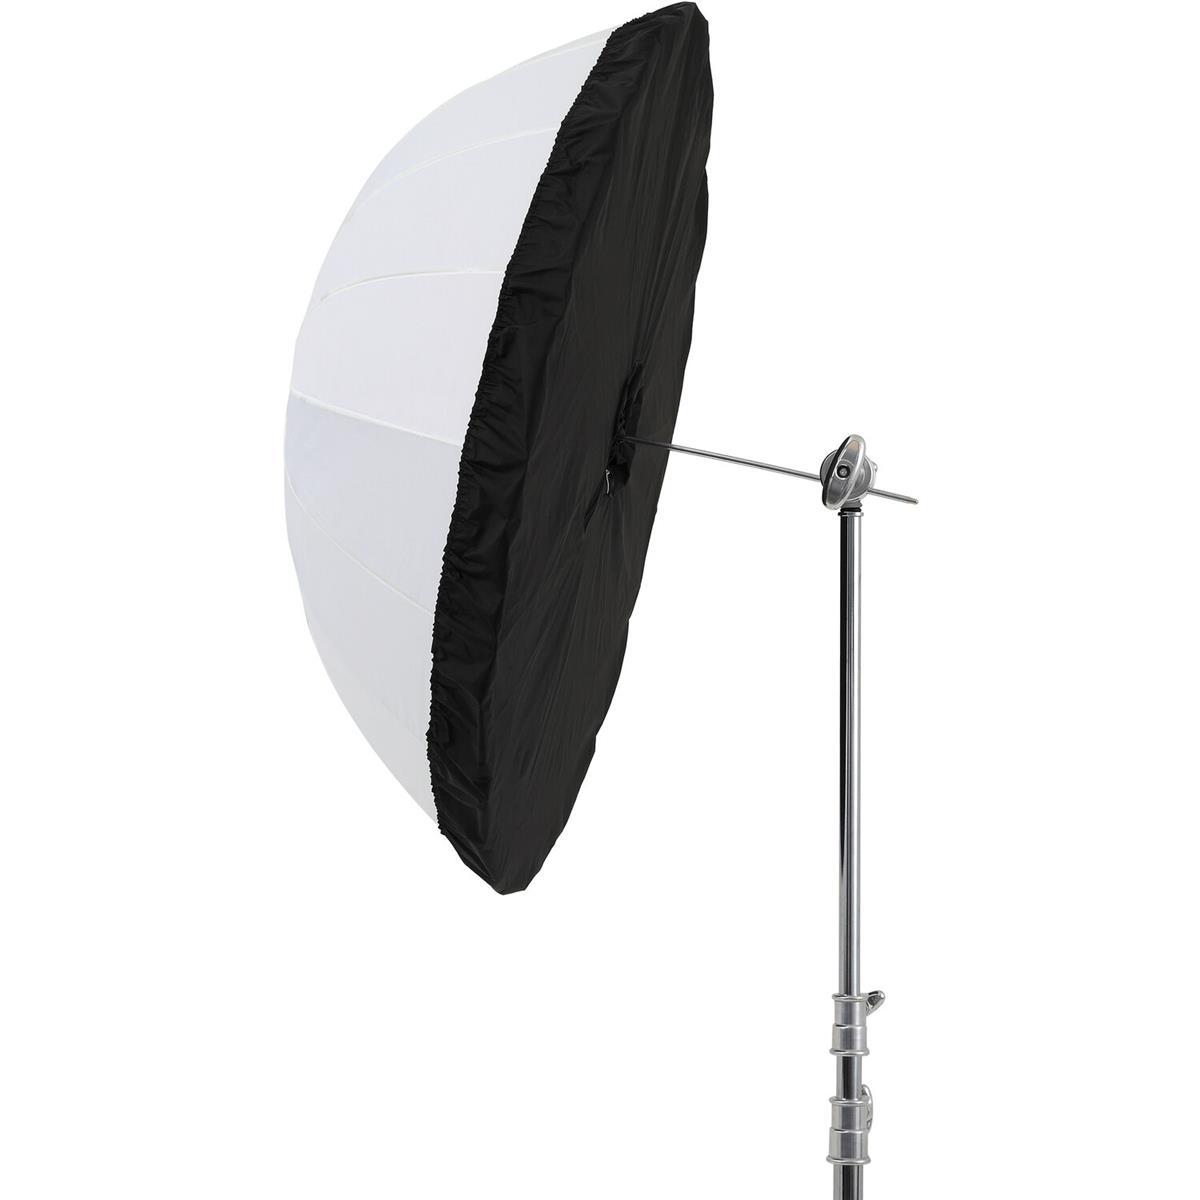 Godox 165 cm Schwarz / Silber Diffusor für Parabolschirm UB-165D